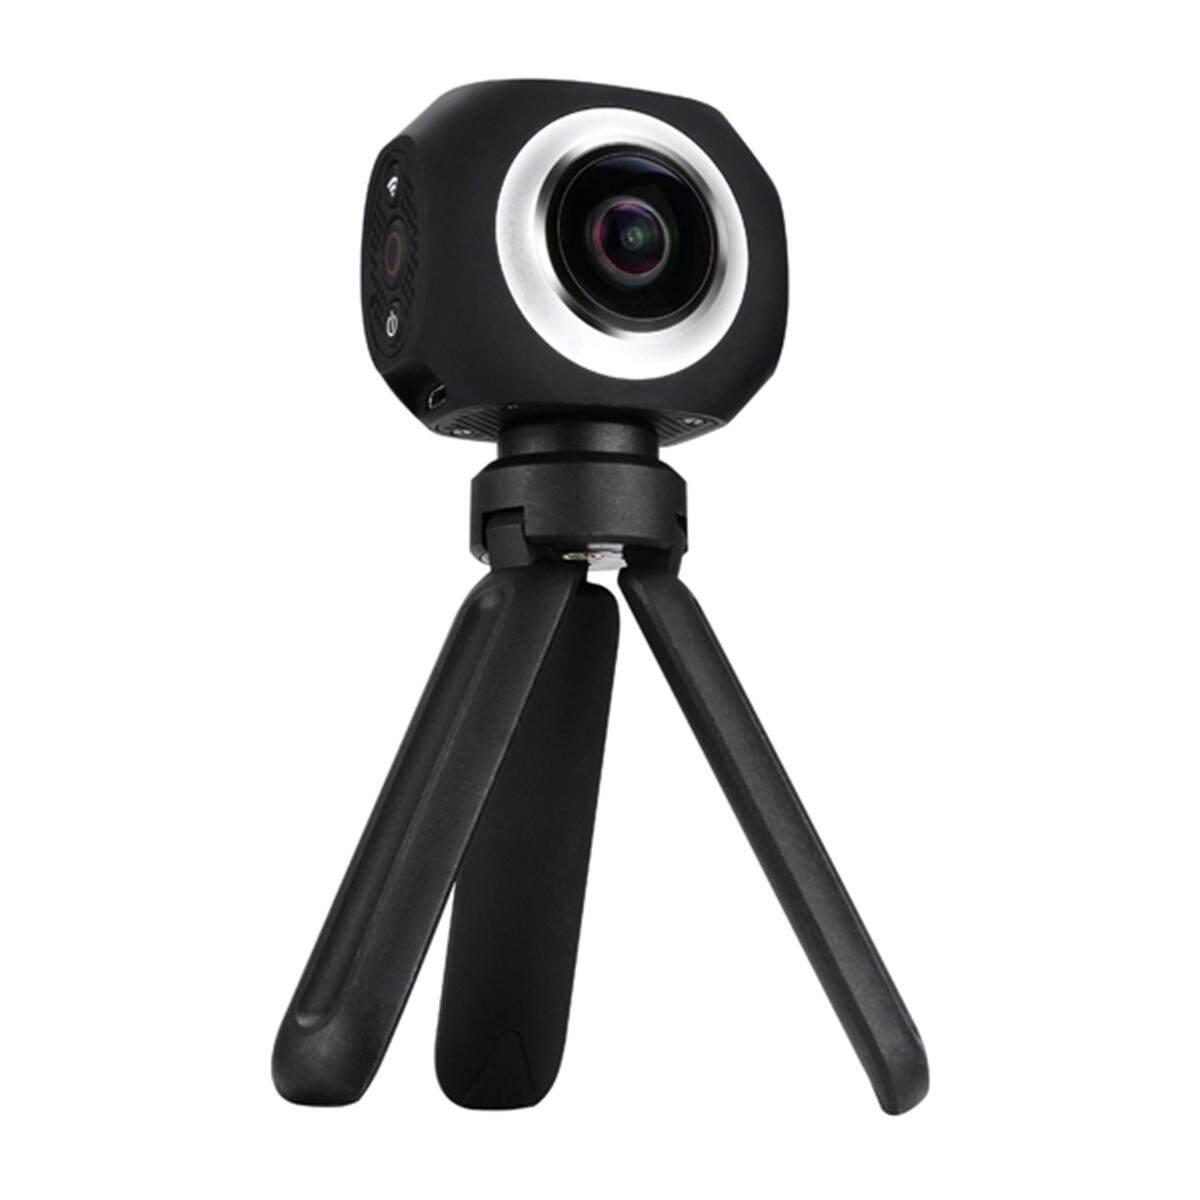 Amkov Dual Lensa 360 Panorama Olahraga Aksi Kamera Video VR Wifi 220 ° Fish-Eye Mengemudi-Intl